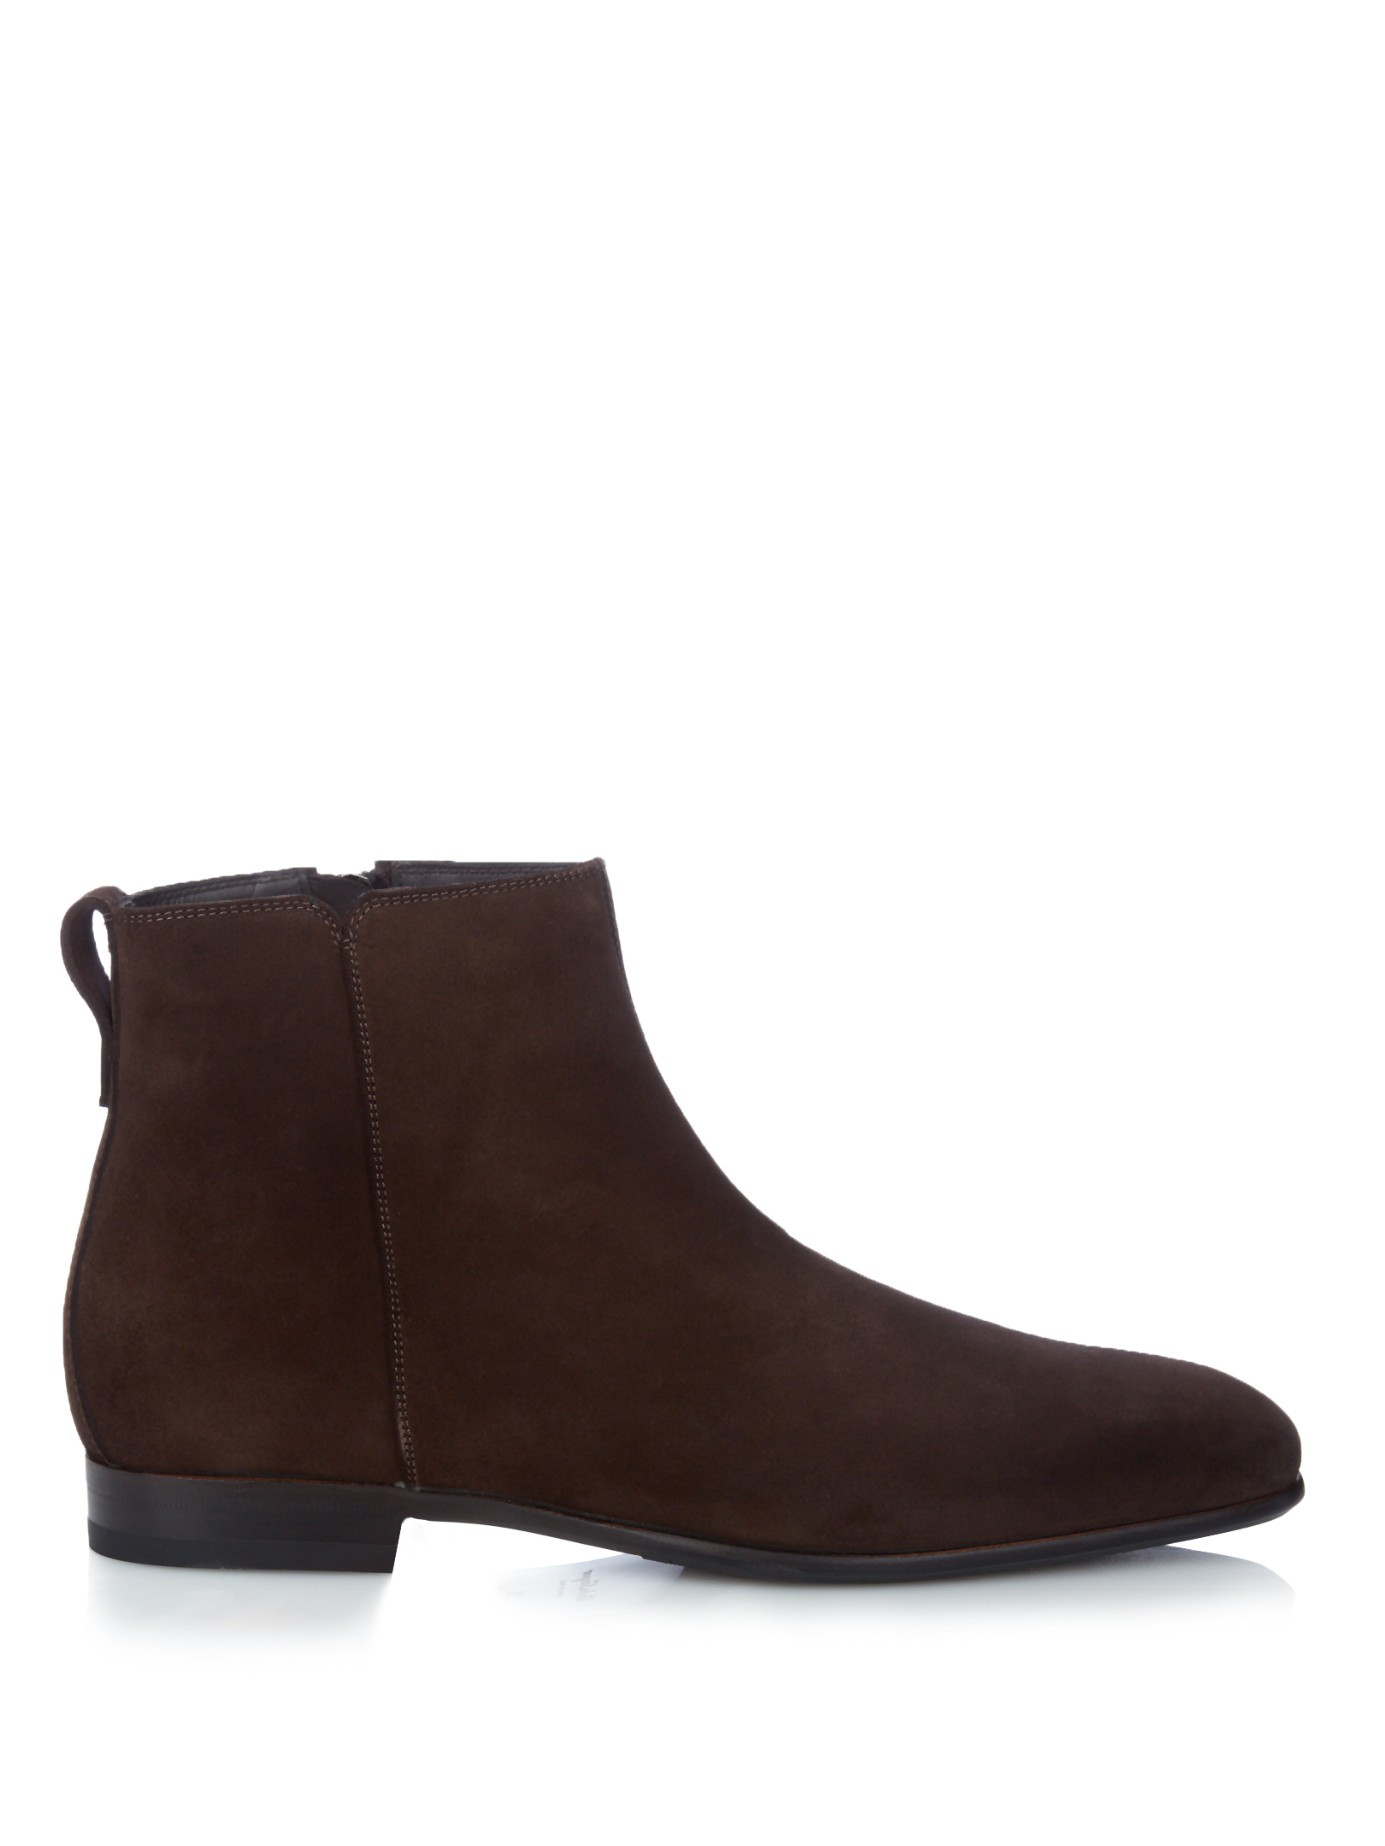 Ferragamo Mistero Suede Chelsea Boots In Brown For Men Lyst